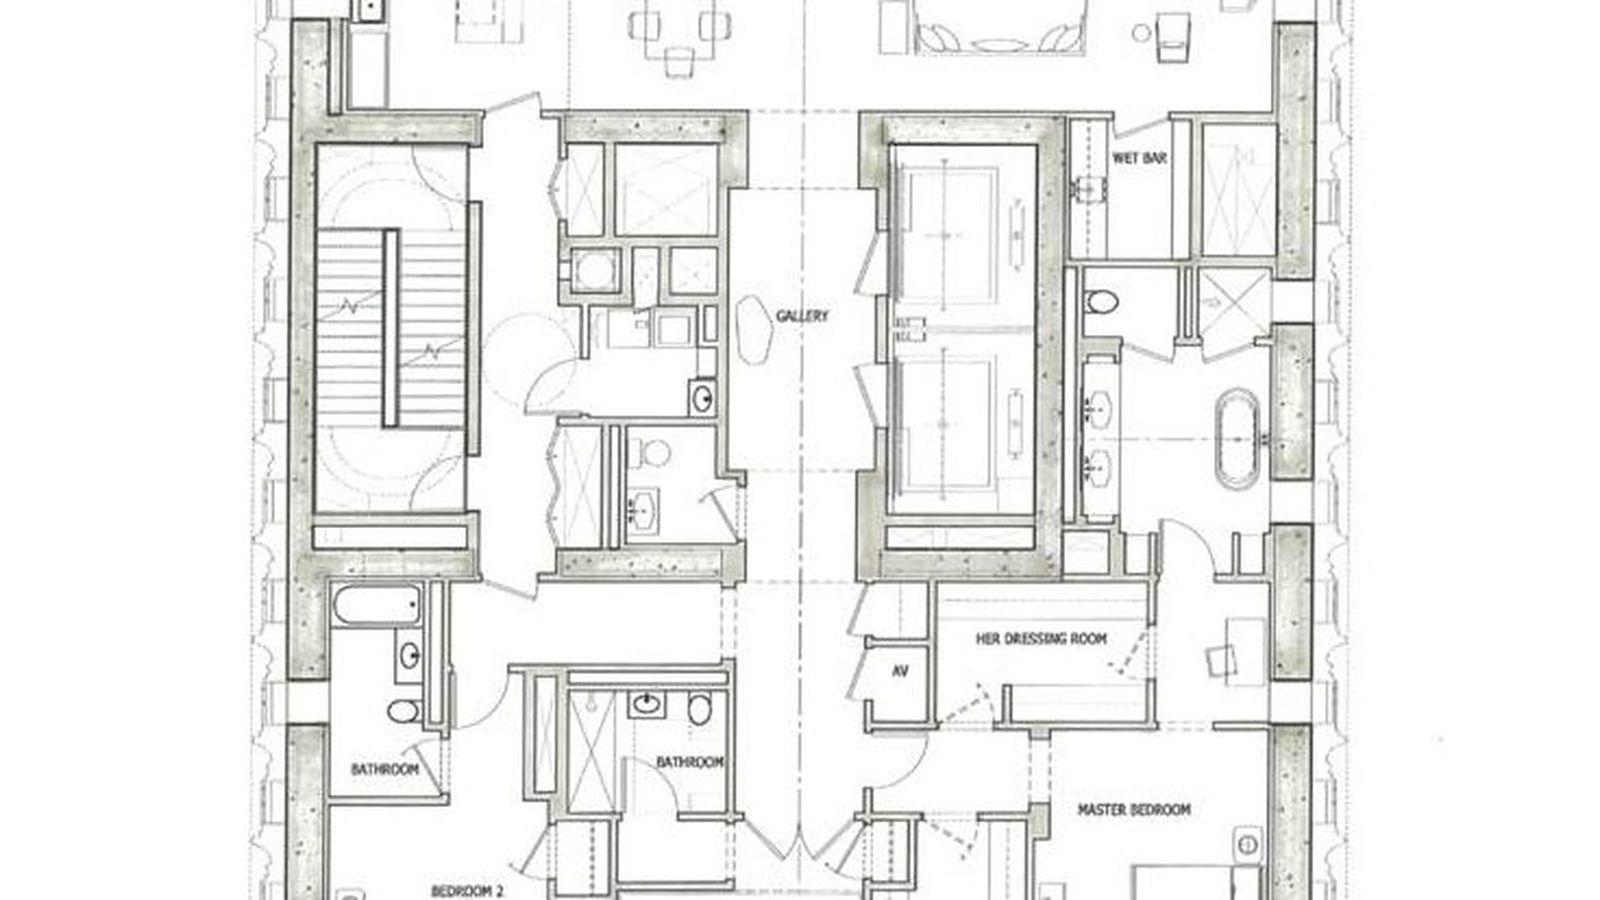 First floorplan for the 39 world 39 s skinniest skyscraper for Floorplan or floor plan